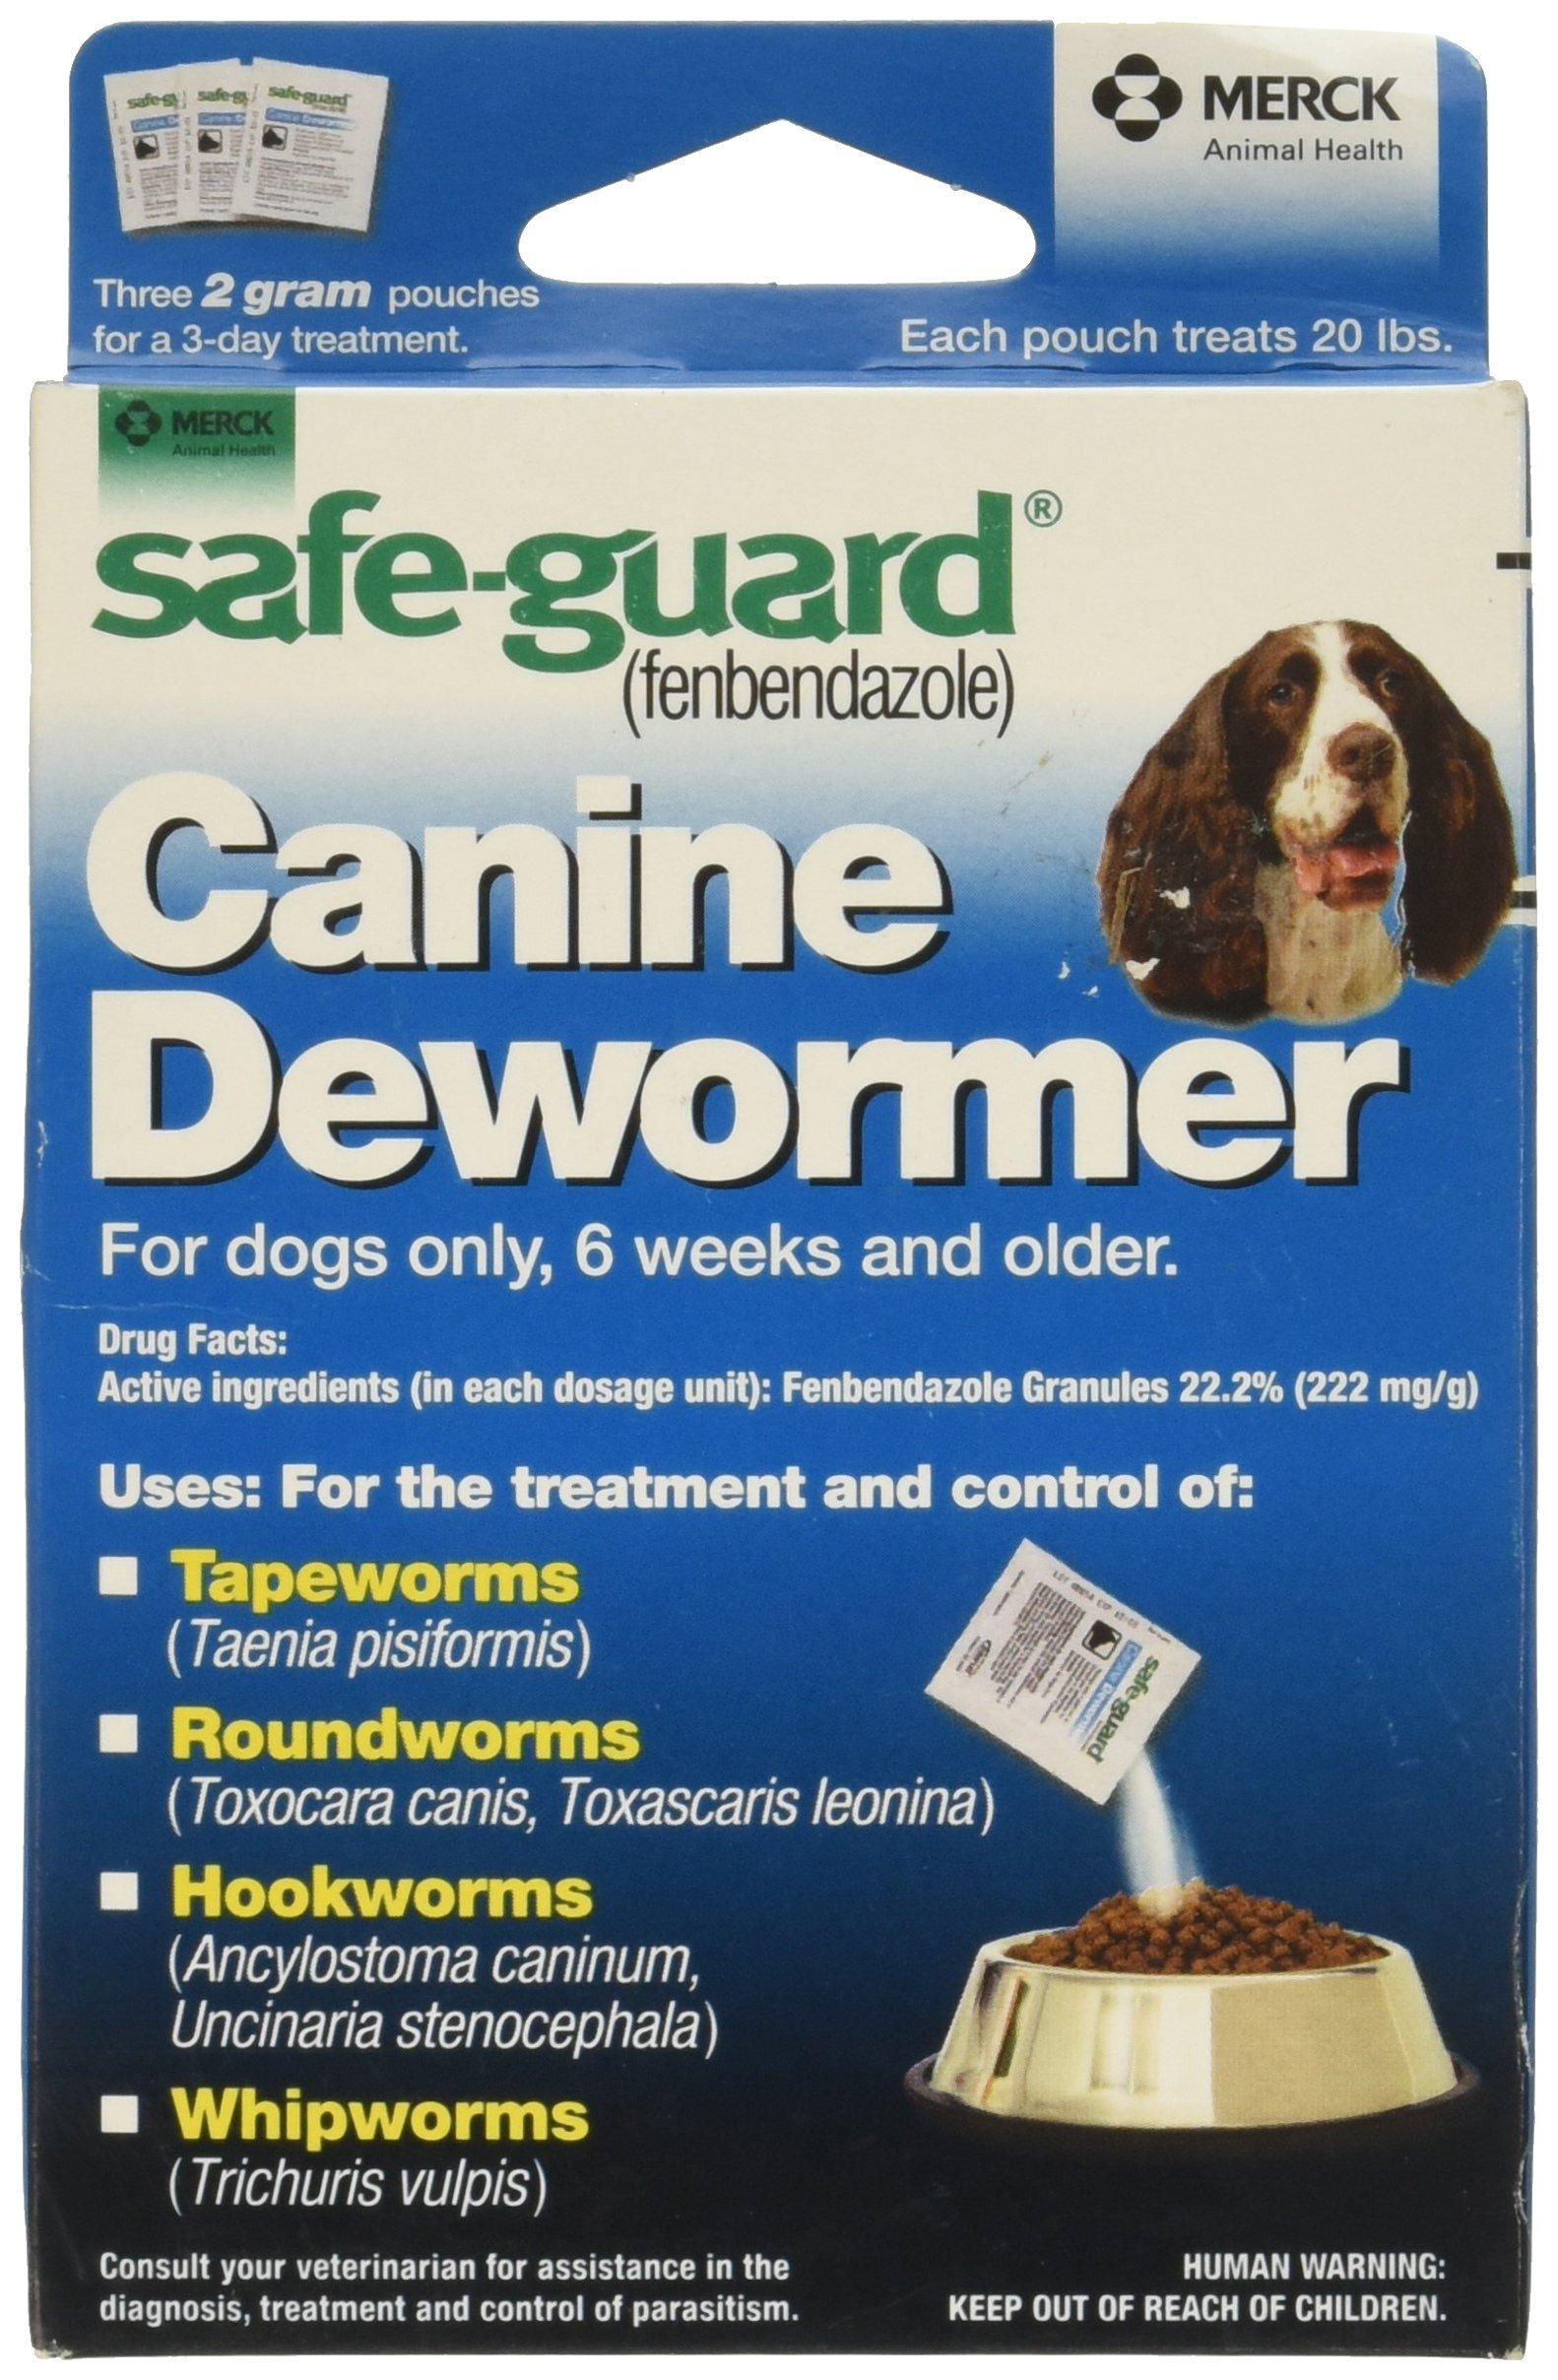 MERCK AH EQUINE D Merck Animal Health Safe Guard Canine Dewormer by MERCK AH EQUINE D (Image #1)